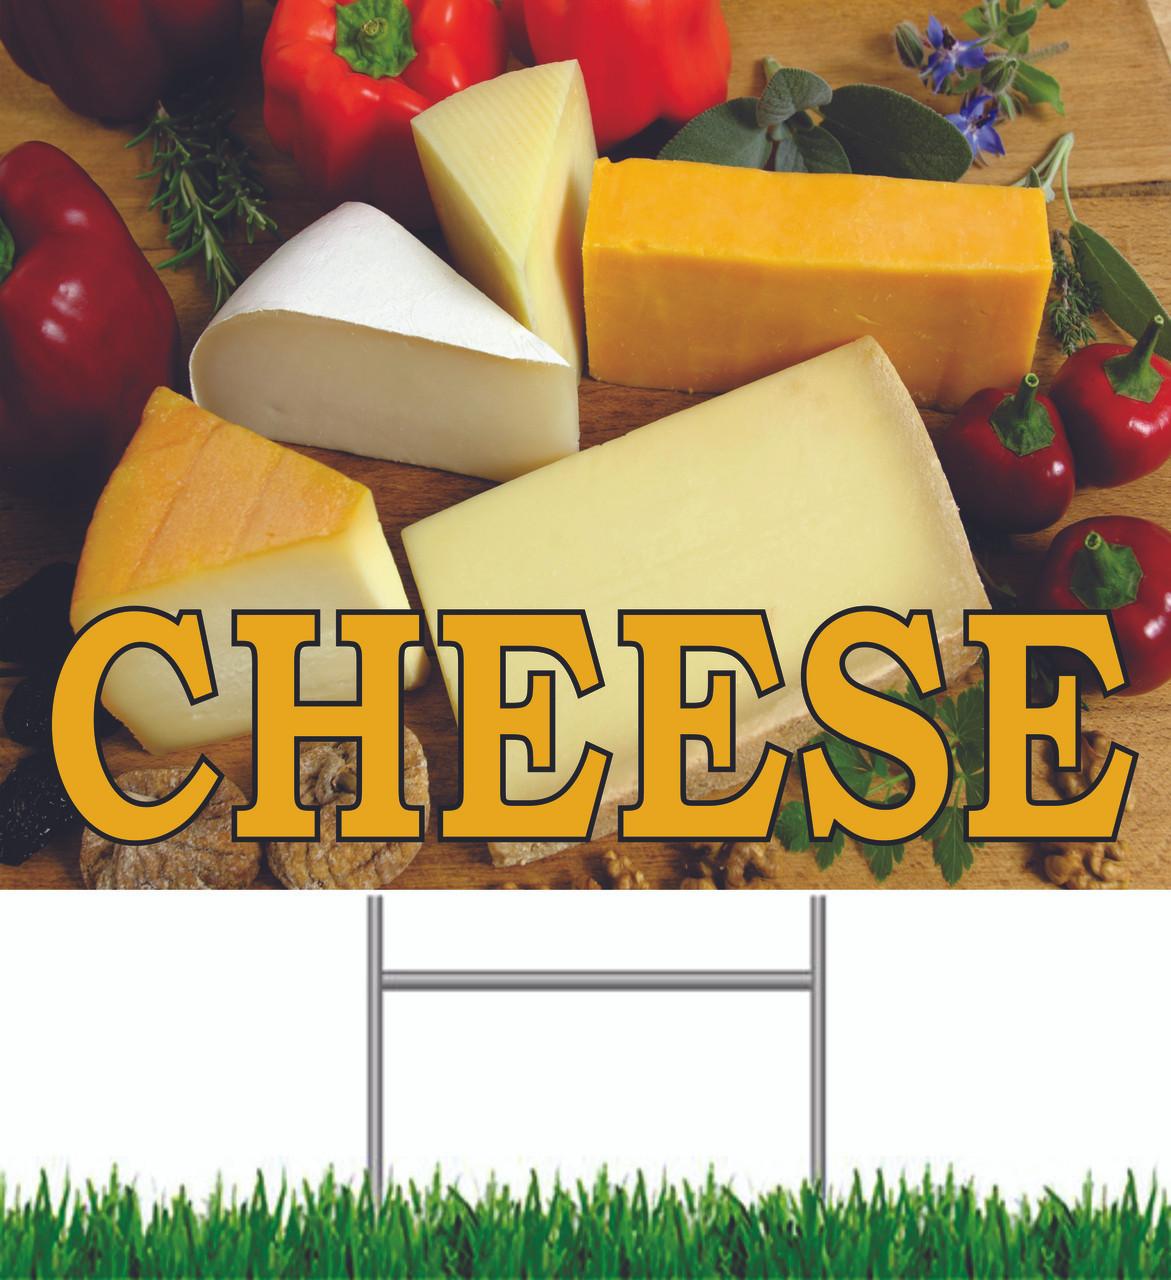 Cheese Yard Sign.